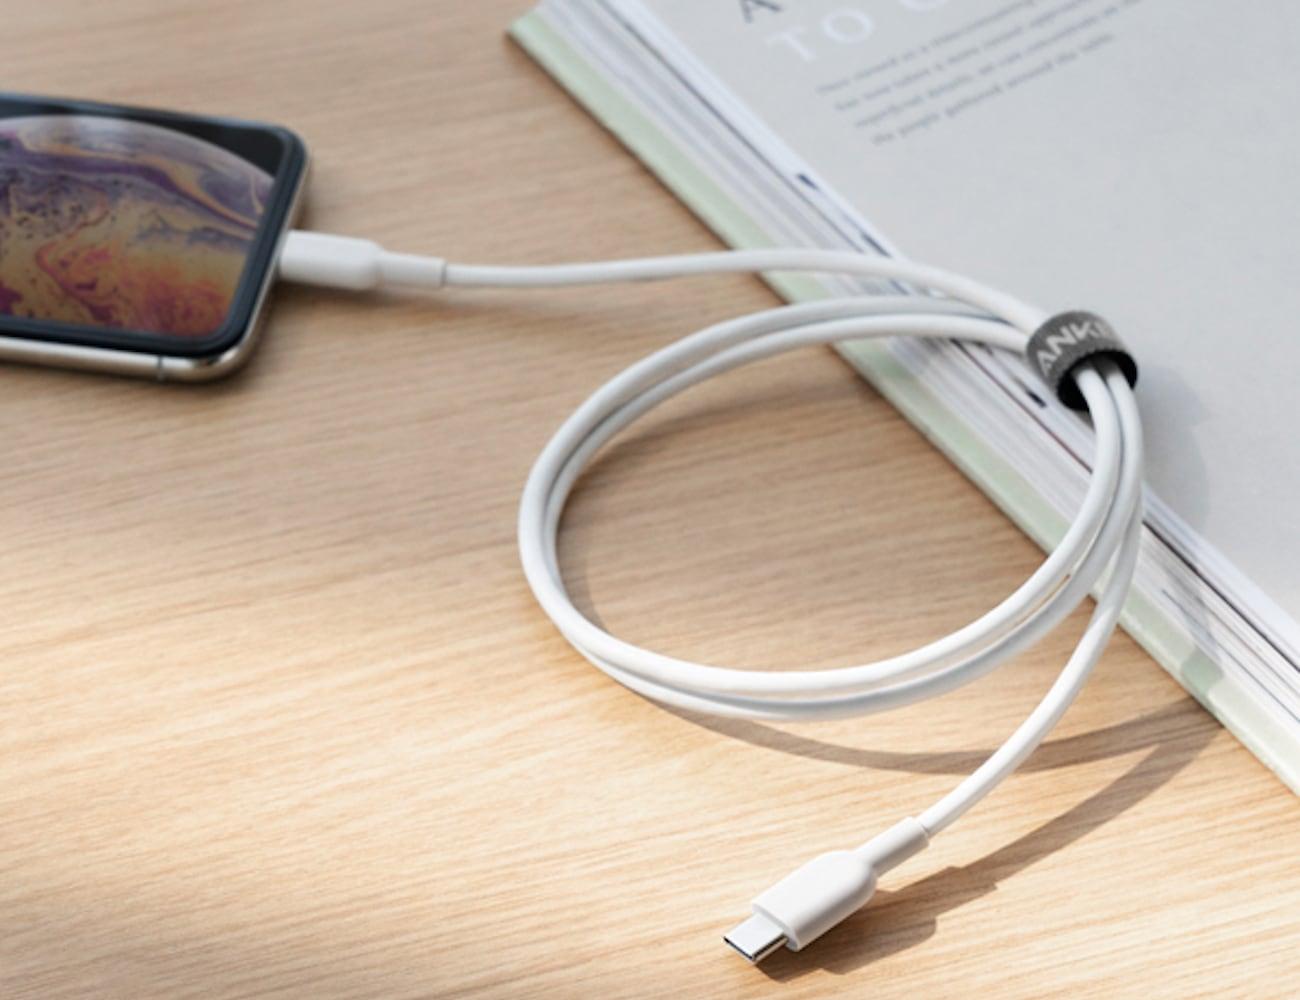 Anker PowerLine II USB-C Lightning Cable